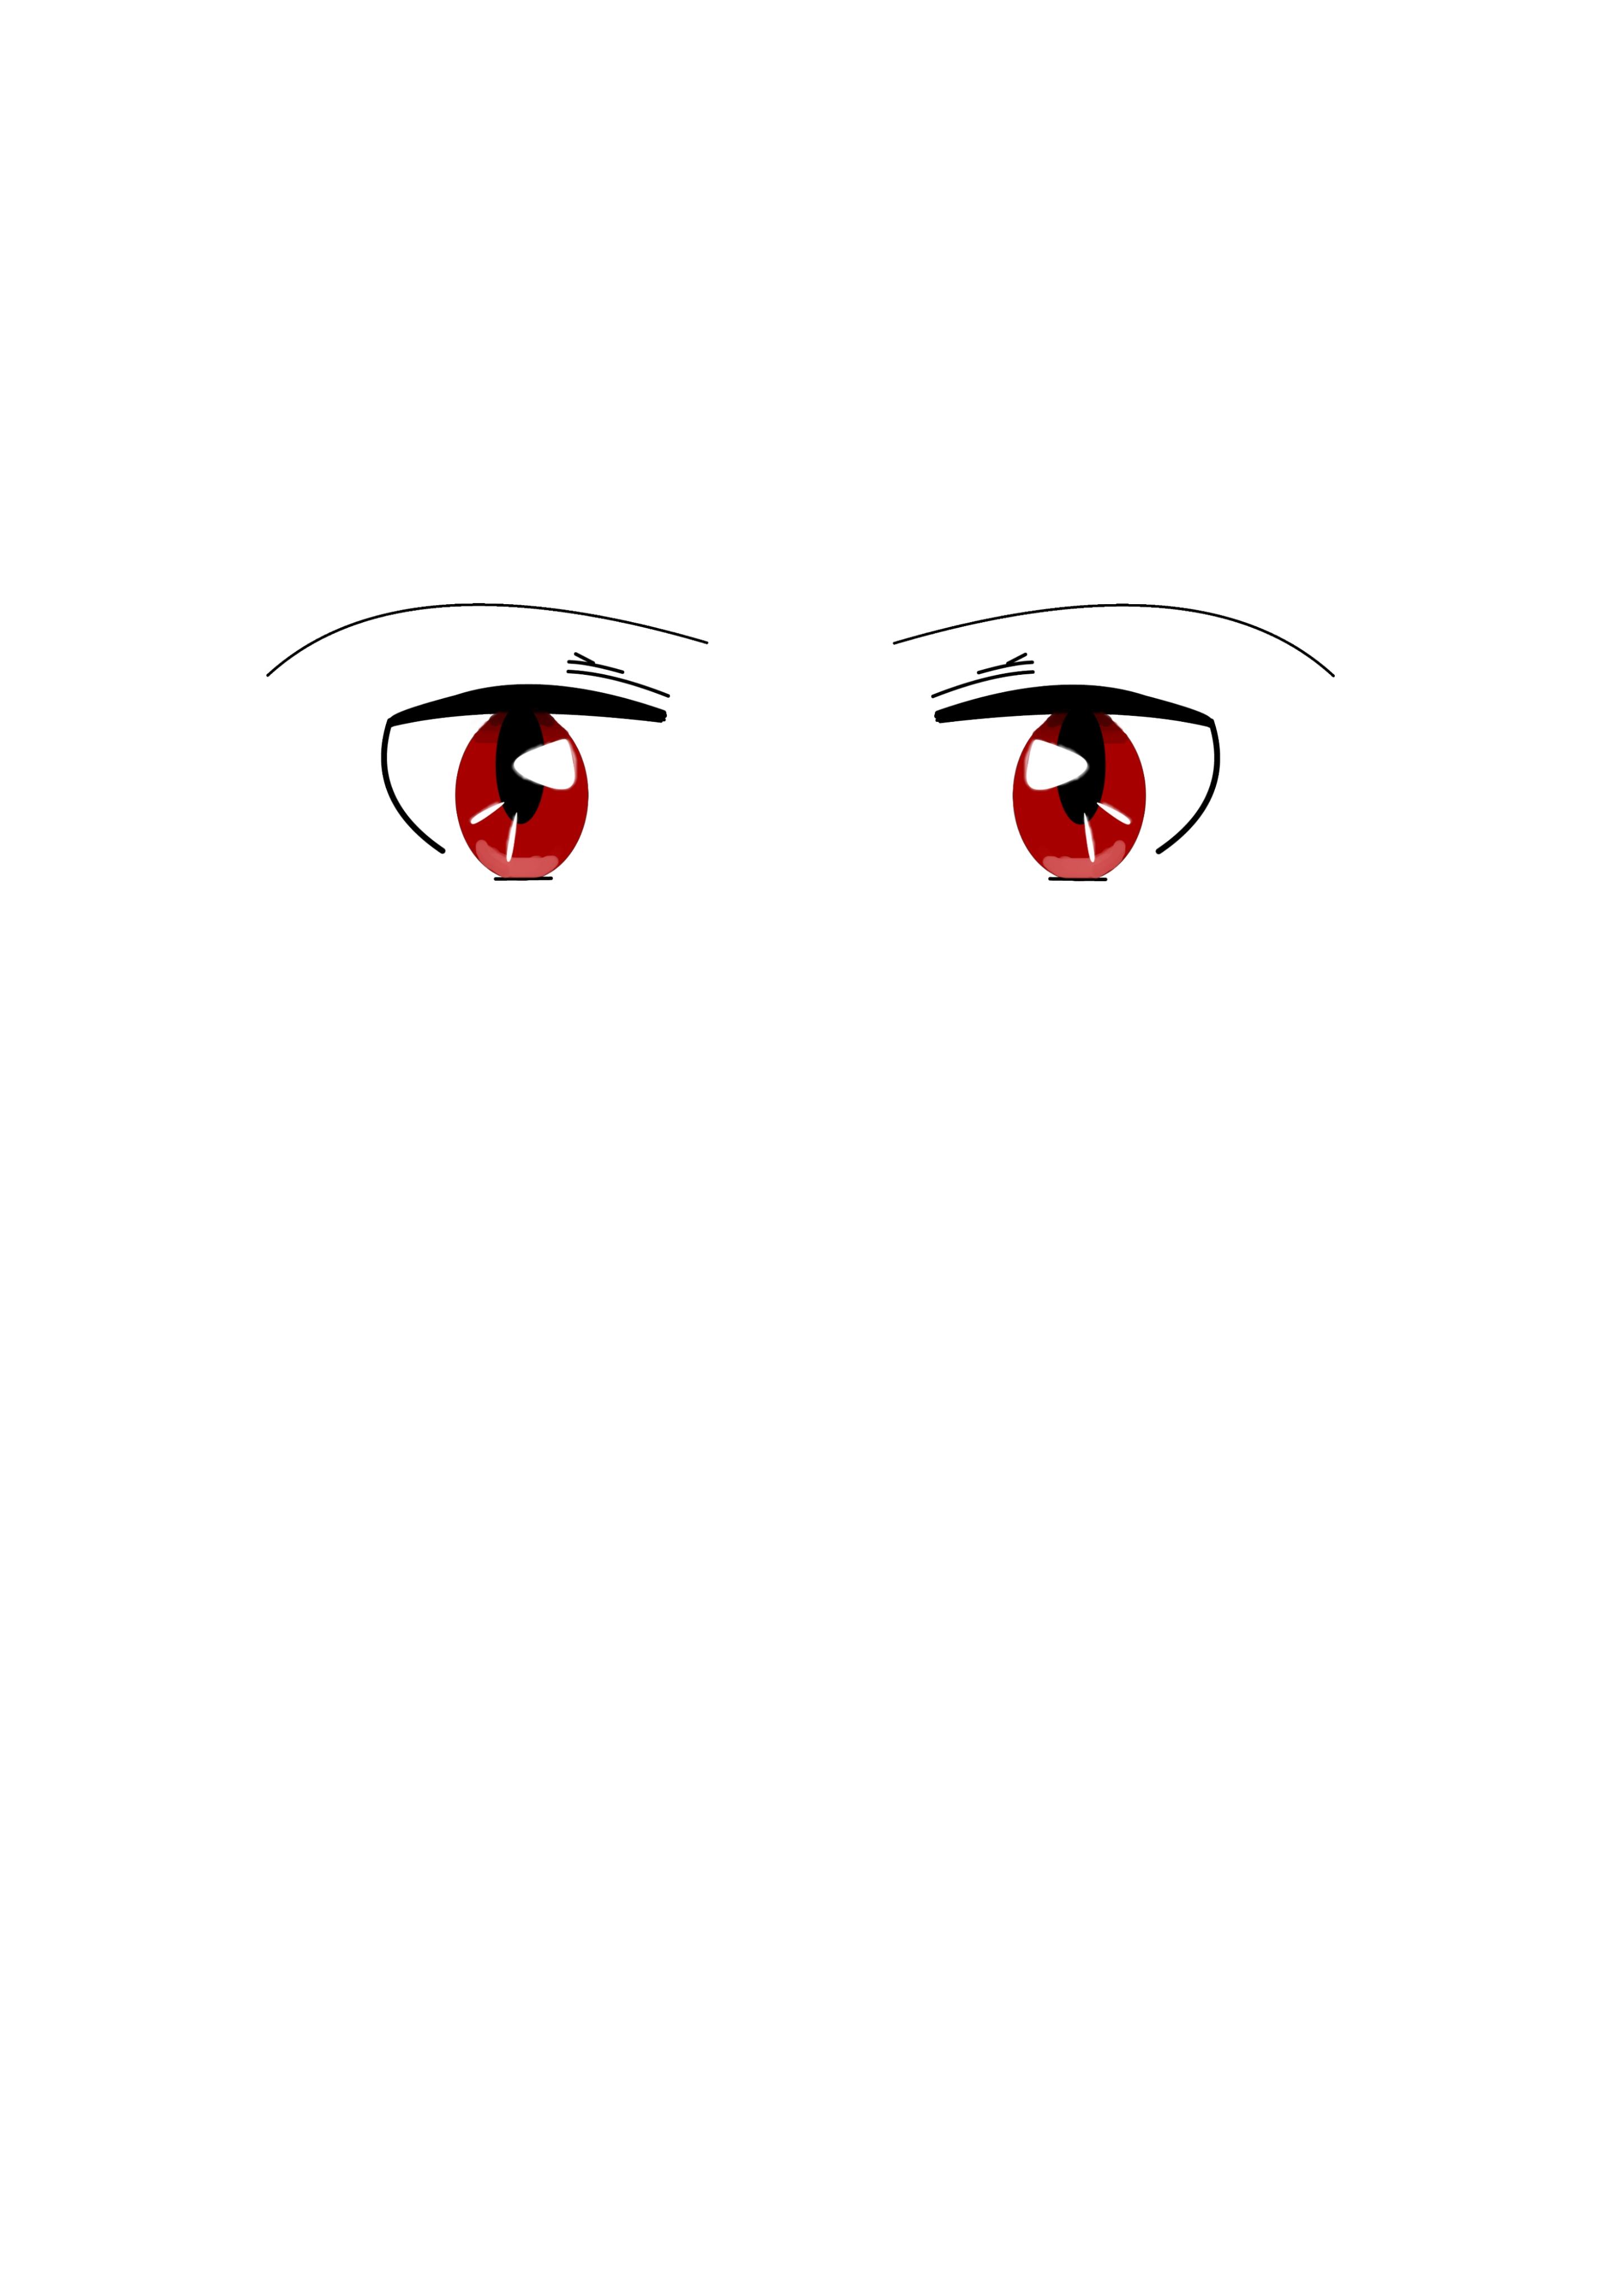 Manga Eyes v7.0